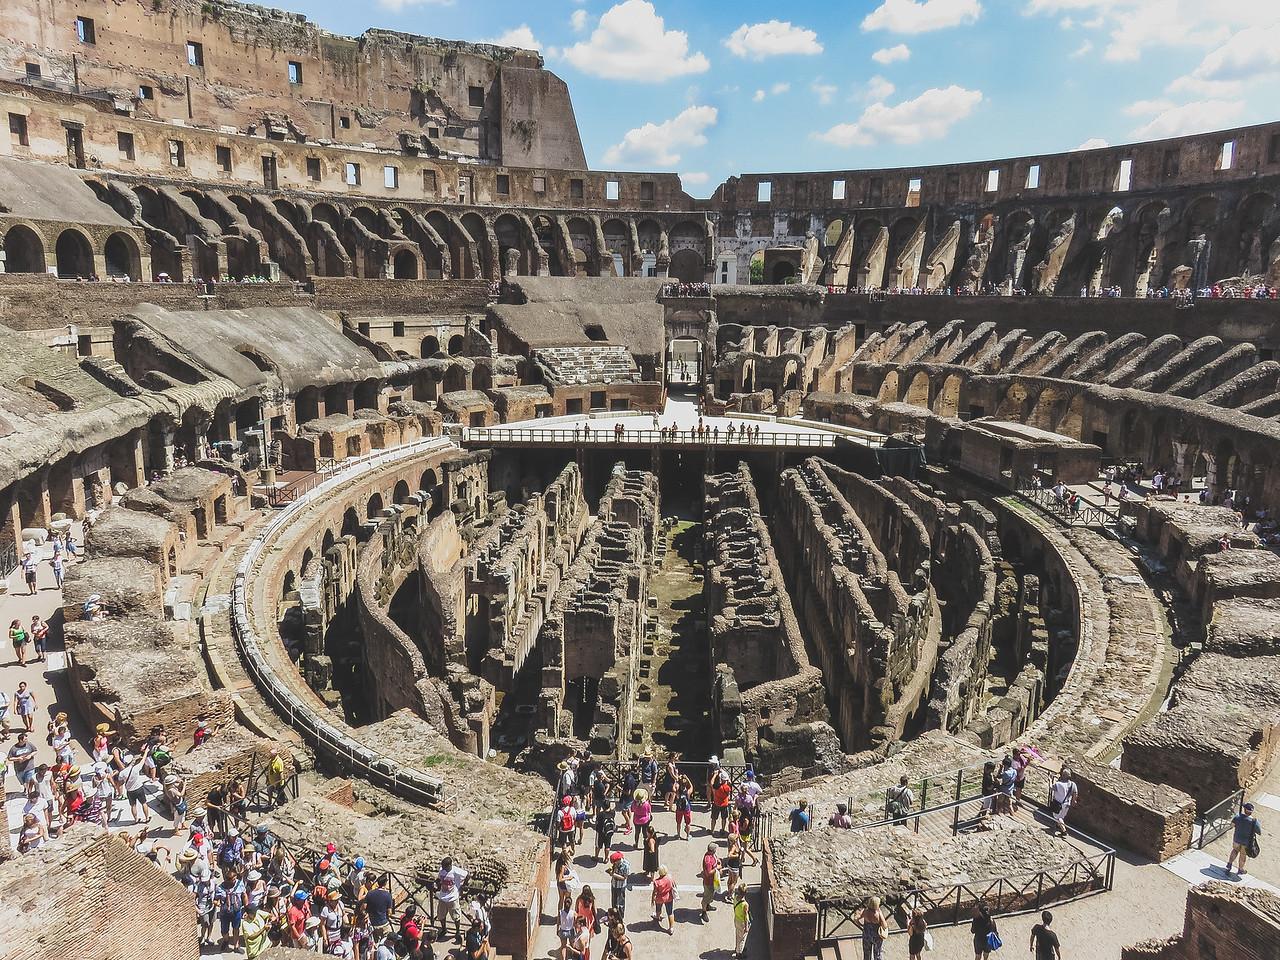 The breath taking Colosseum in Rome